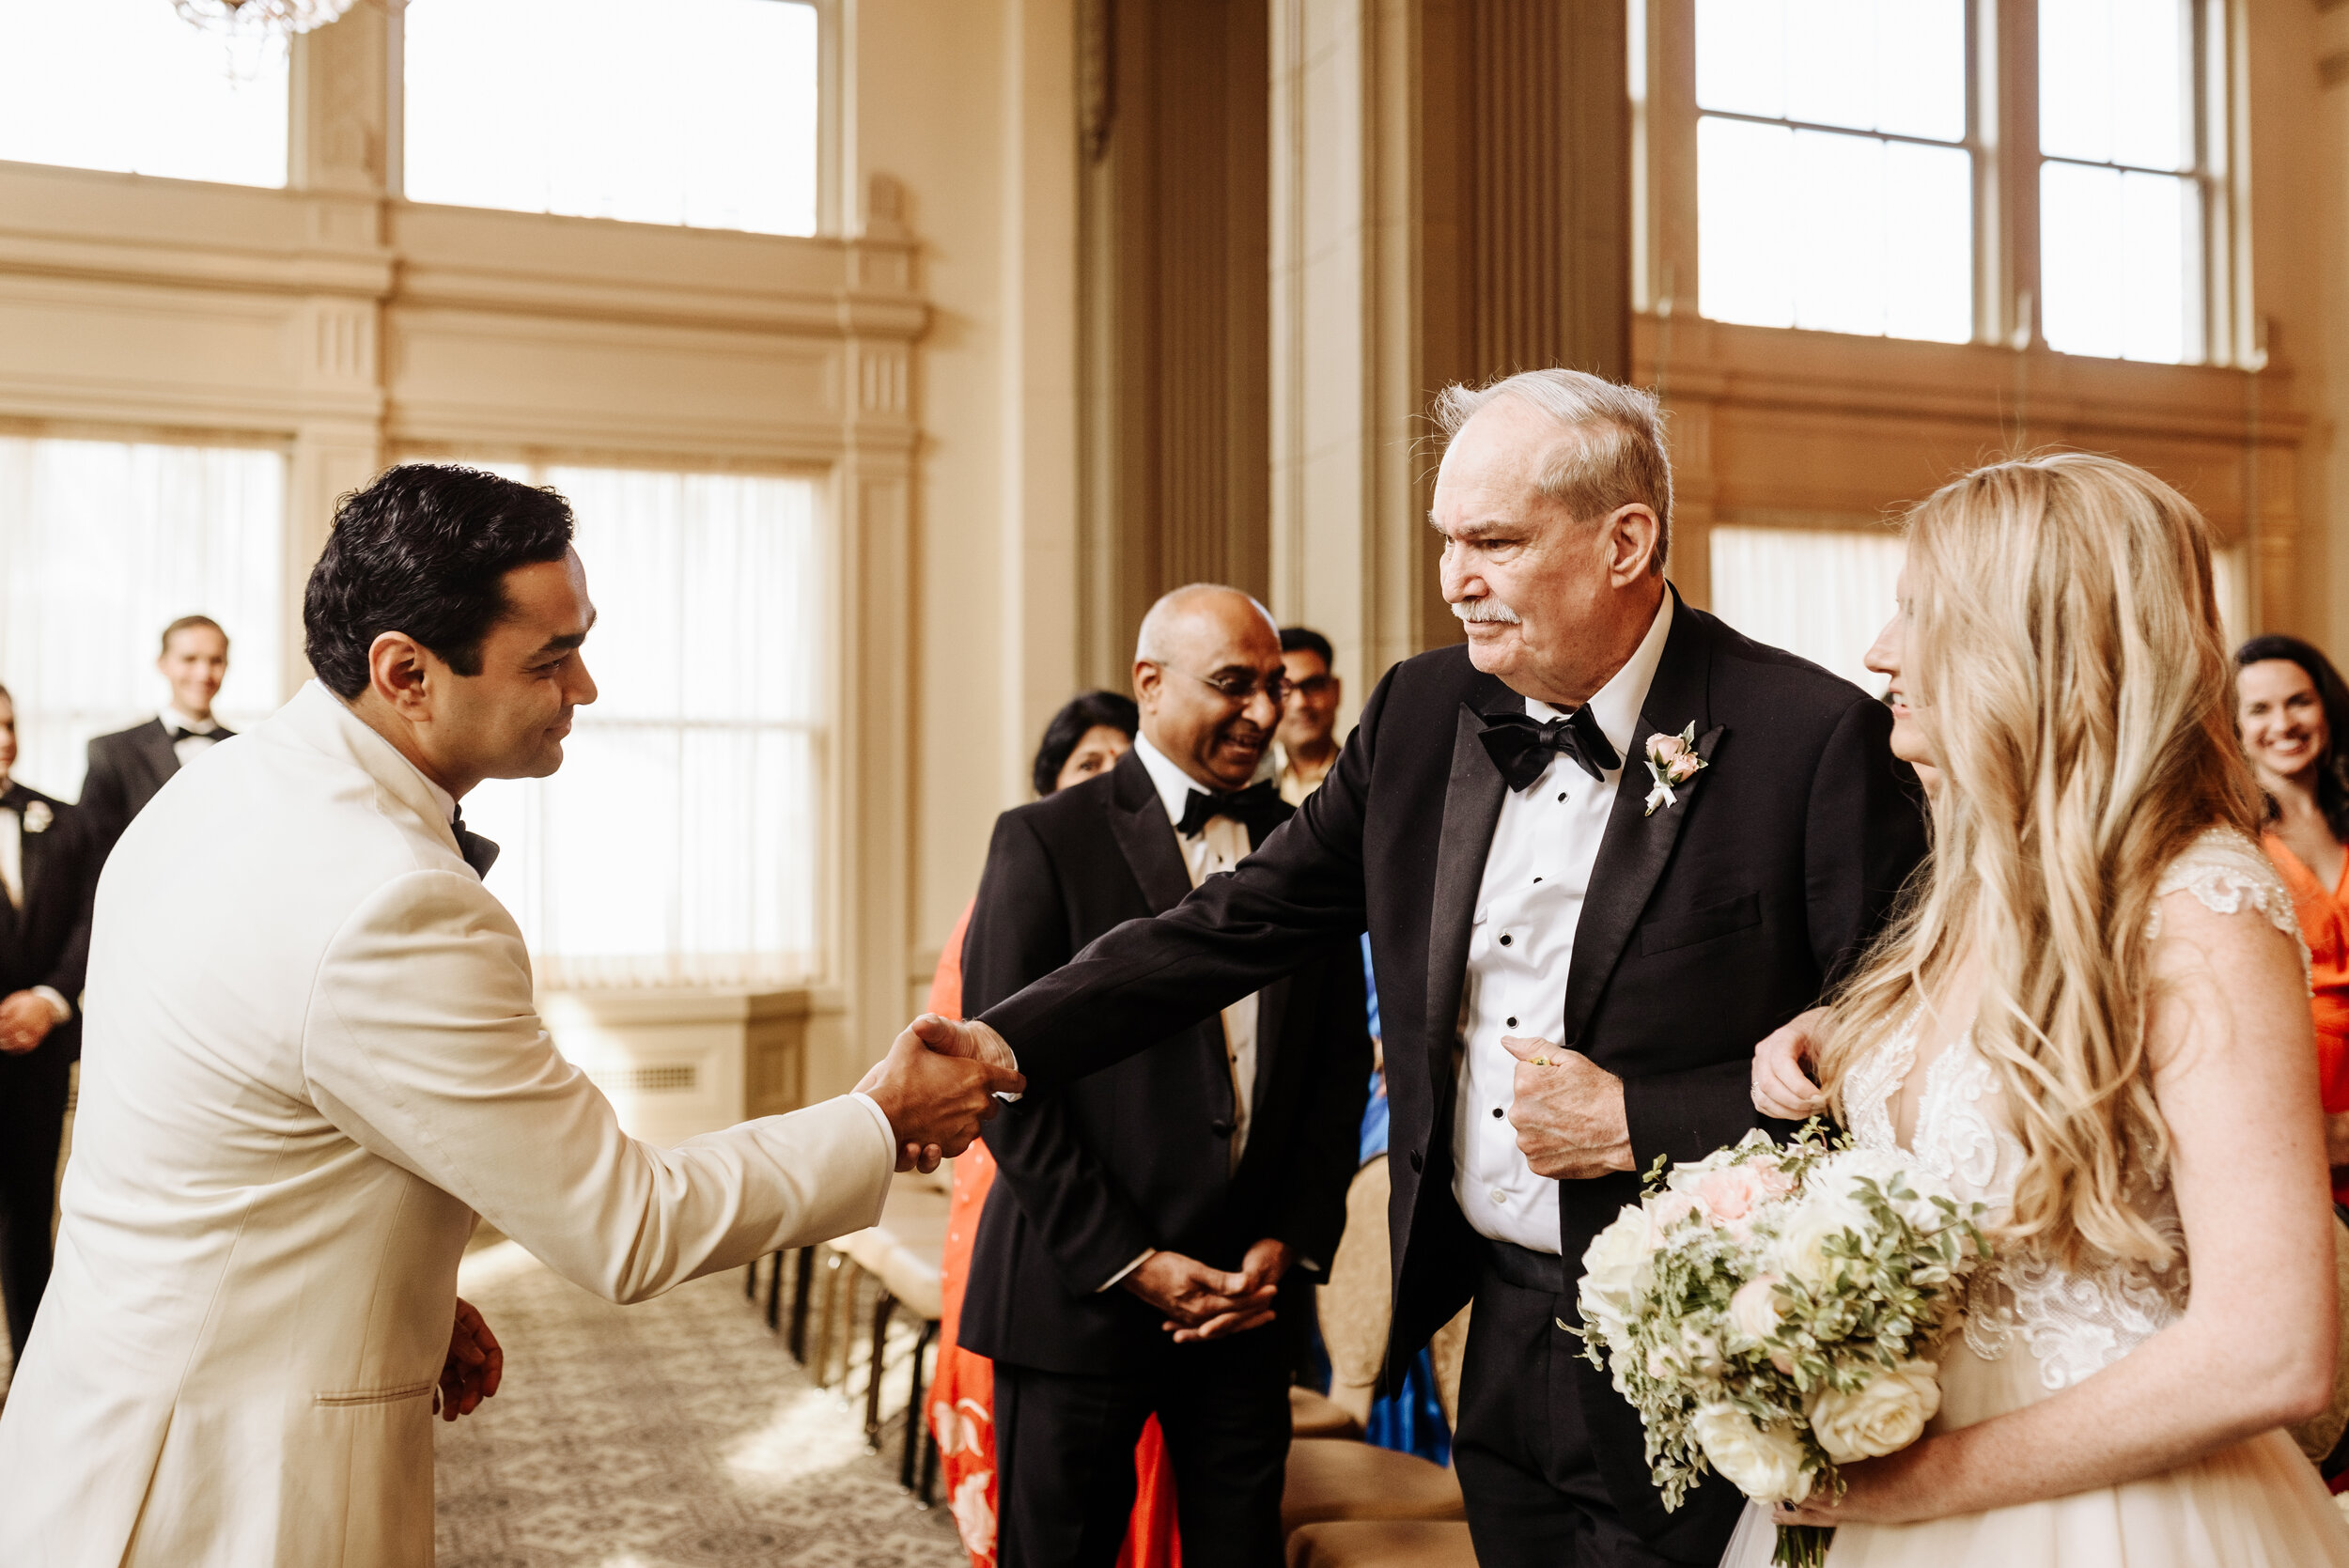 Cassie-Mrunal-Wedding-Quirk-Hotel-John-Marshall-Ballrooms-Richmond-Virginia-Photography-by-V-73.jpg